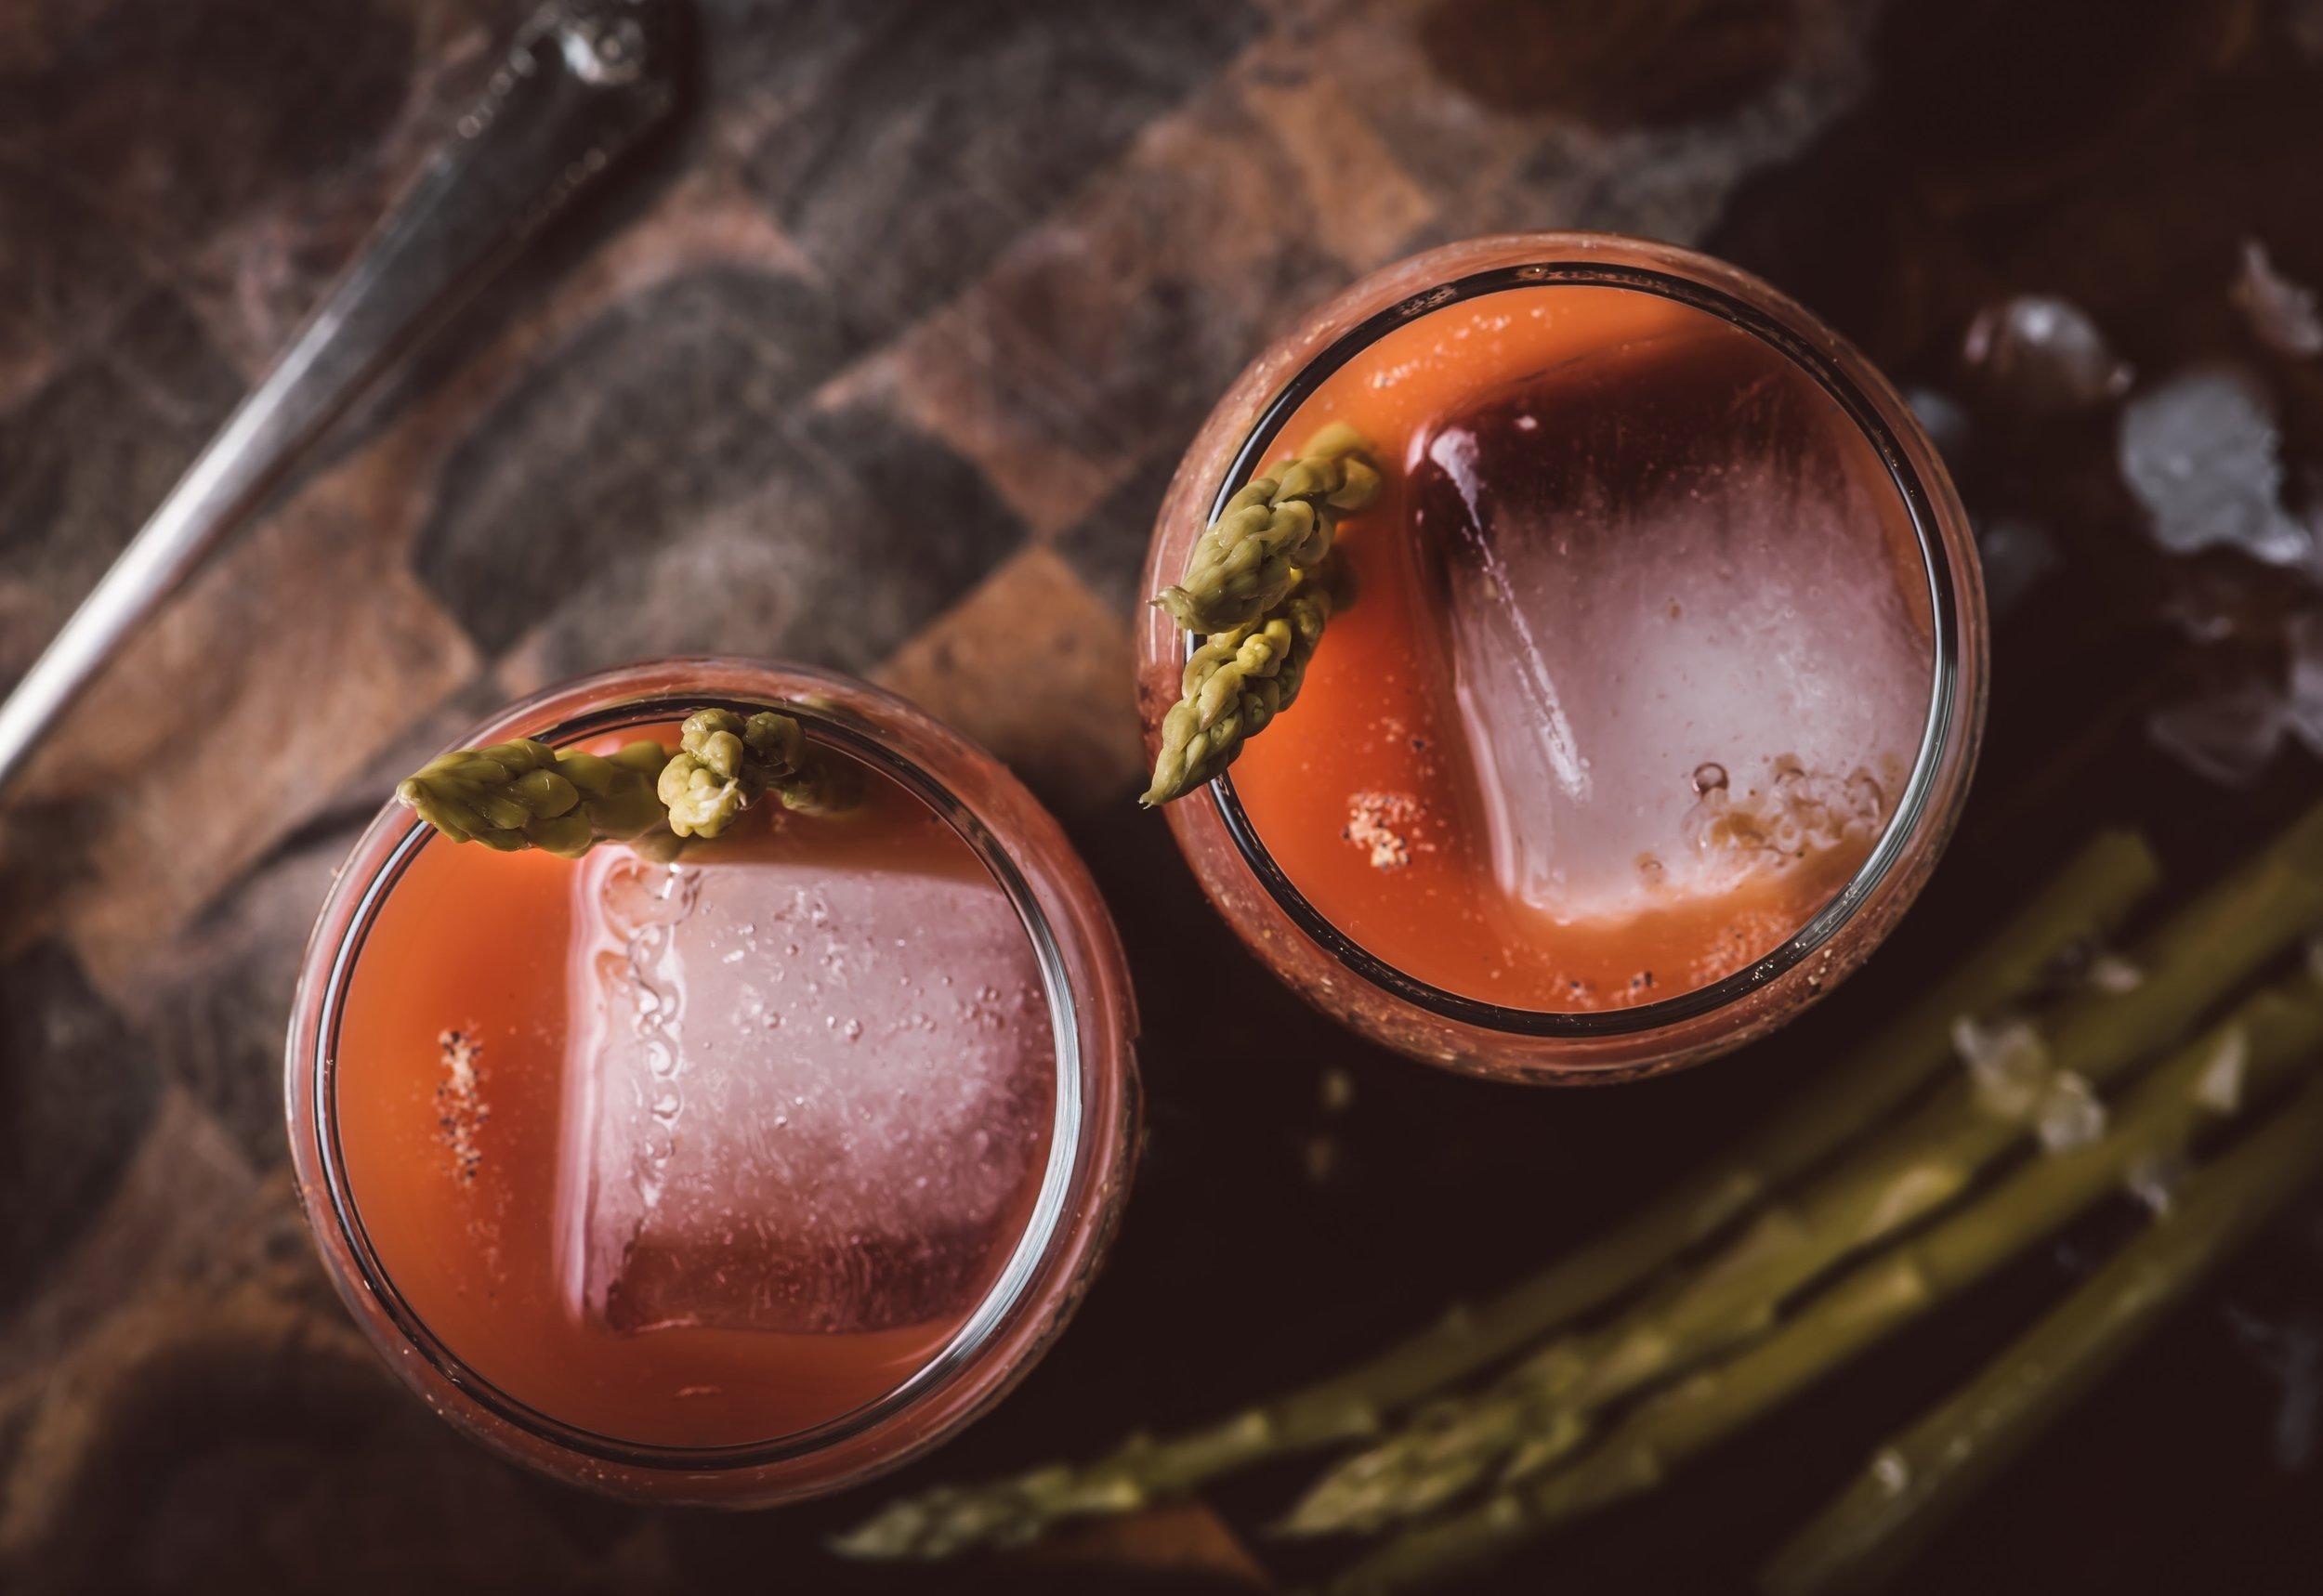 Pickled-Asparagus-jar-sessions.jpg